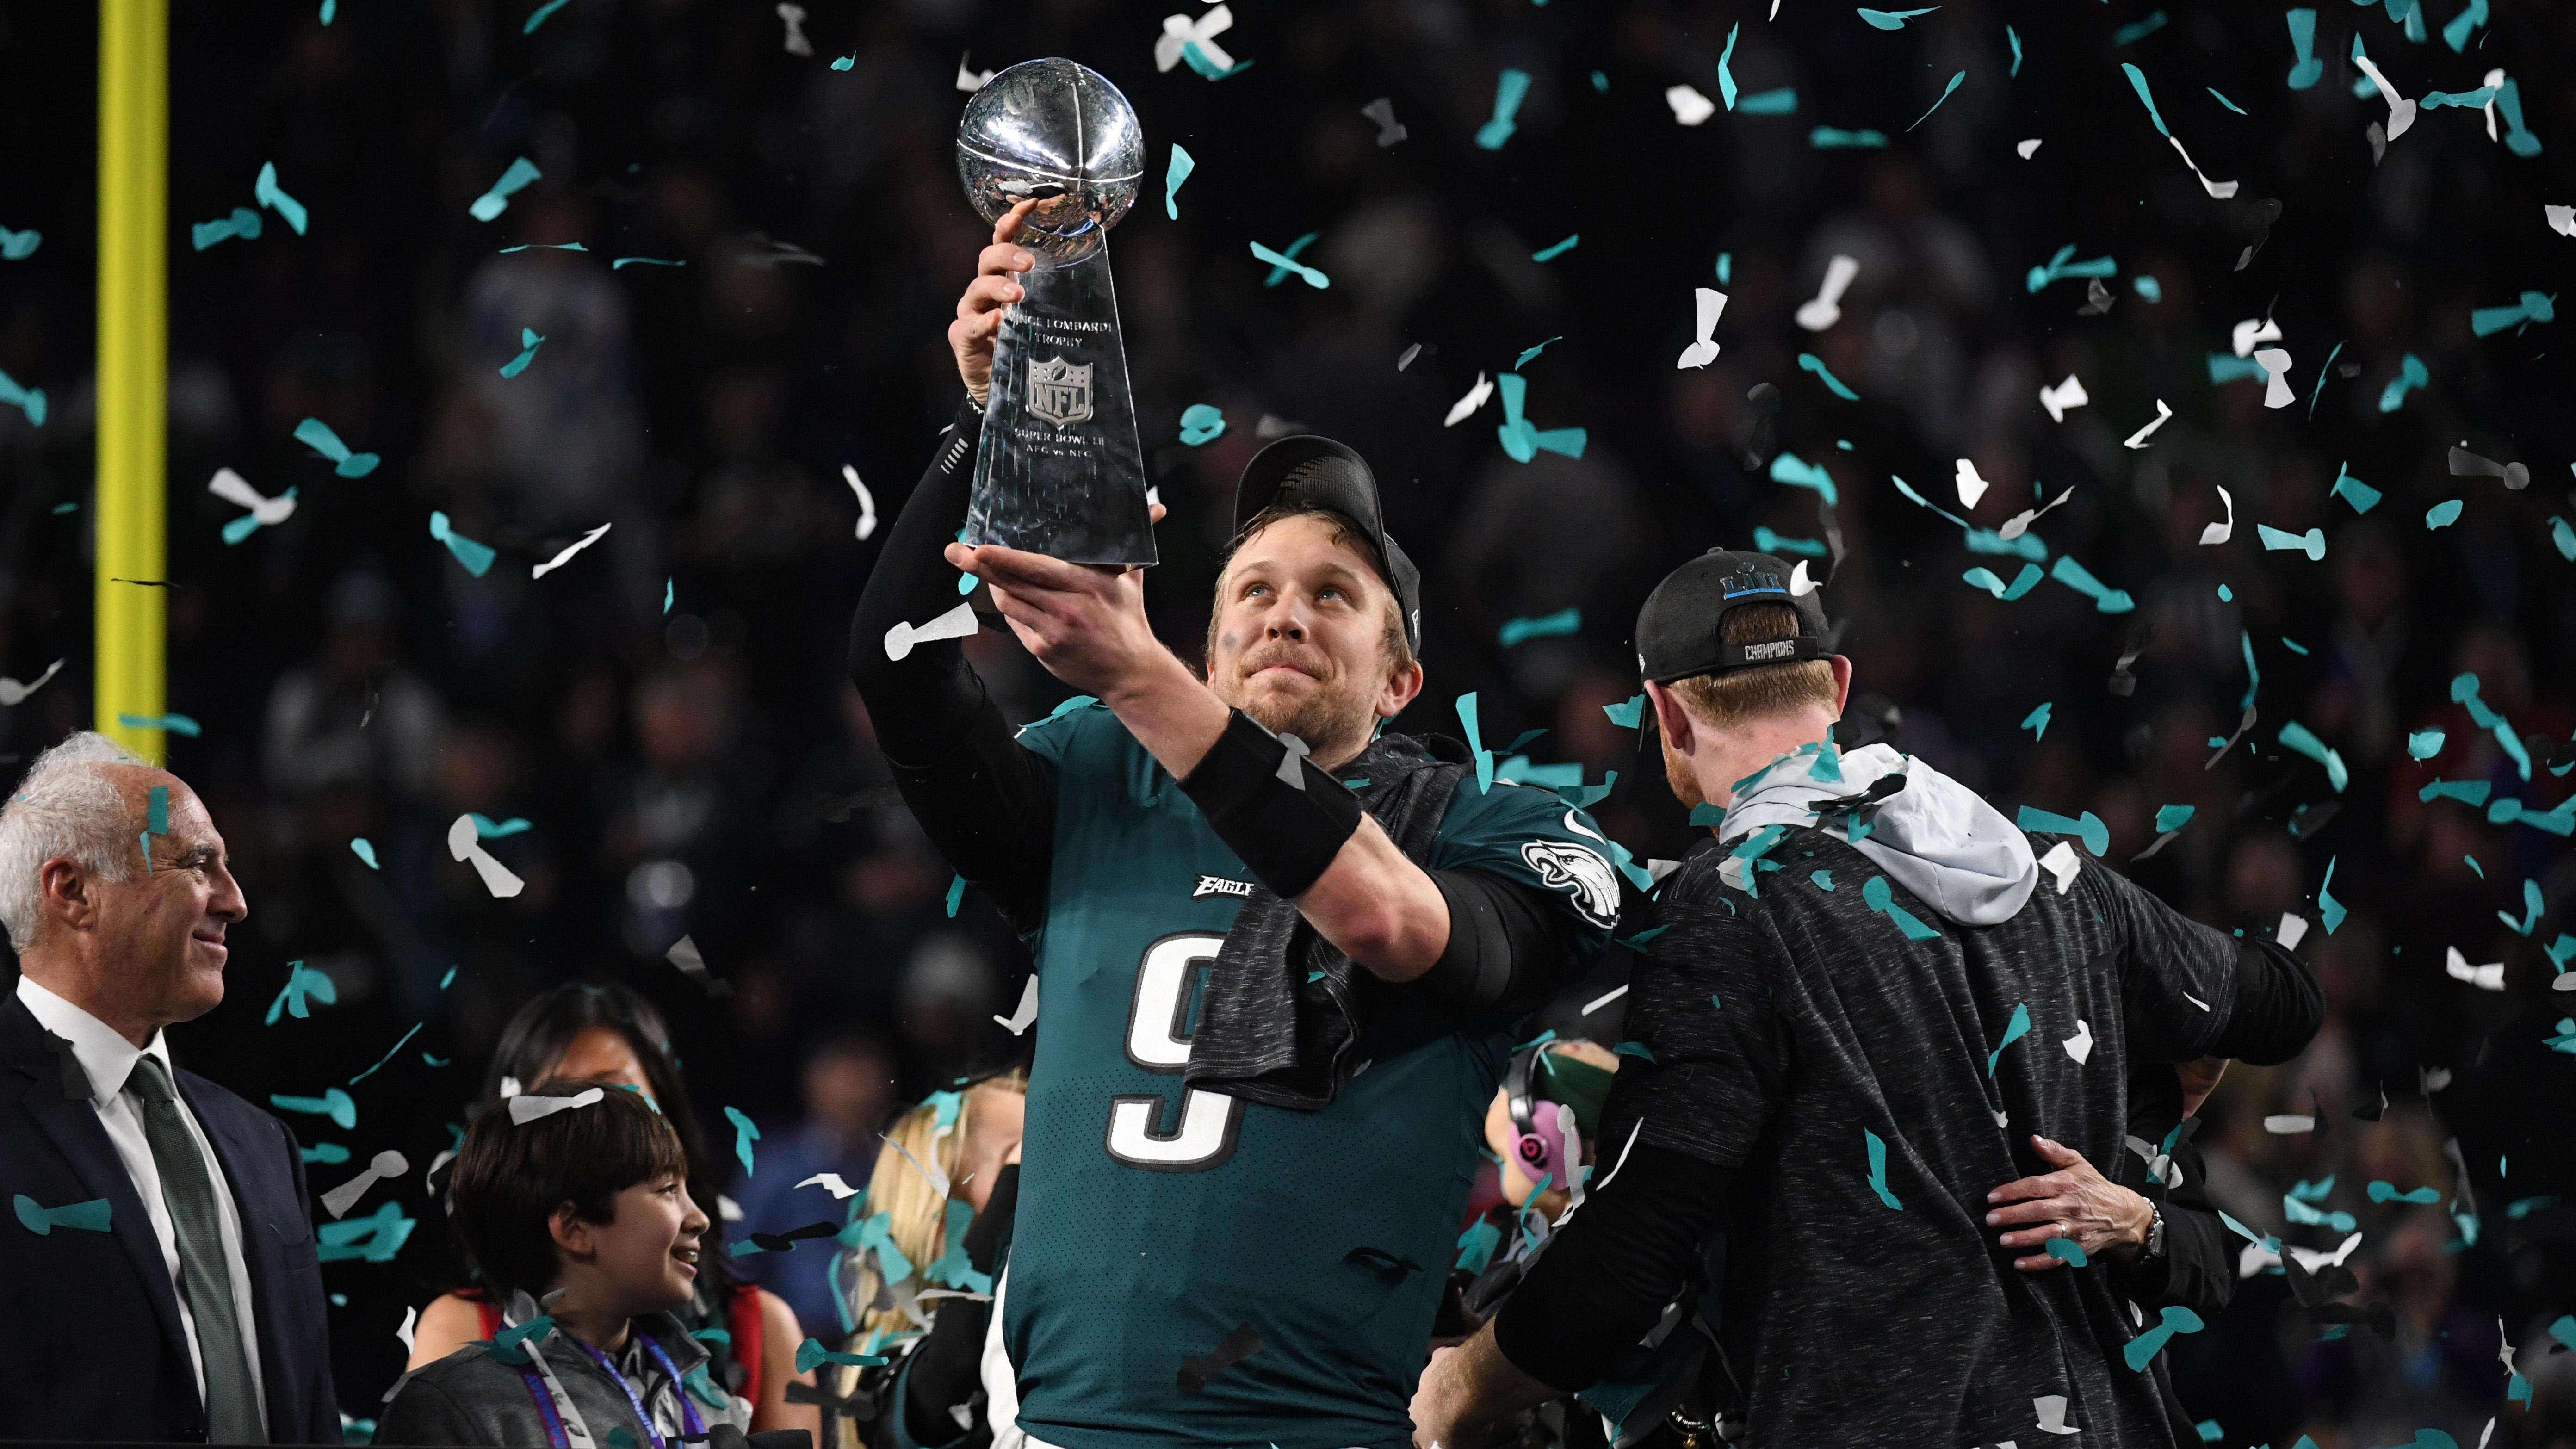 Philadelphia Eagles quarterback Nick Foles with the Super Bowl trophy